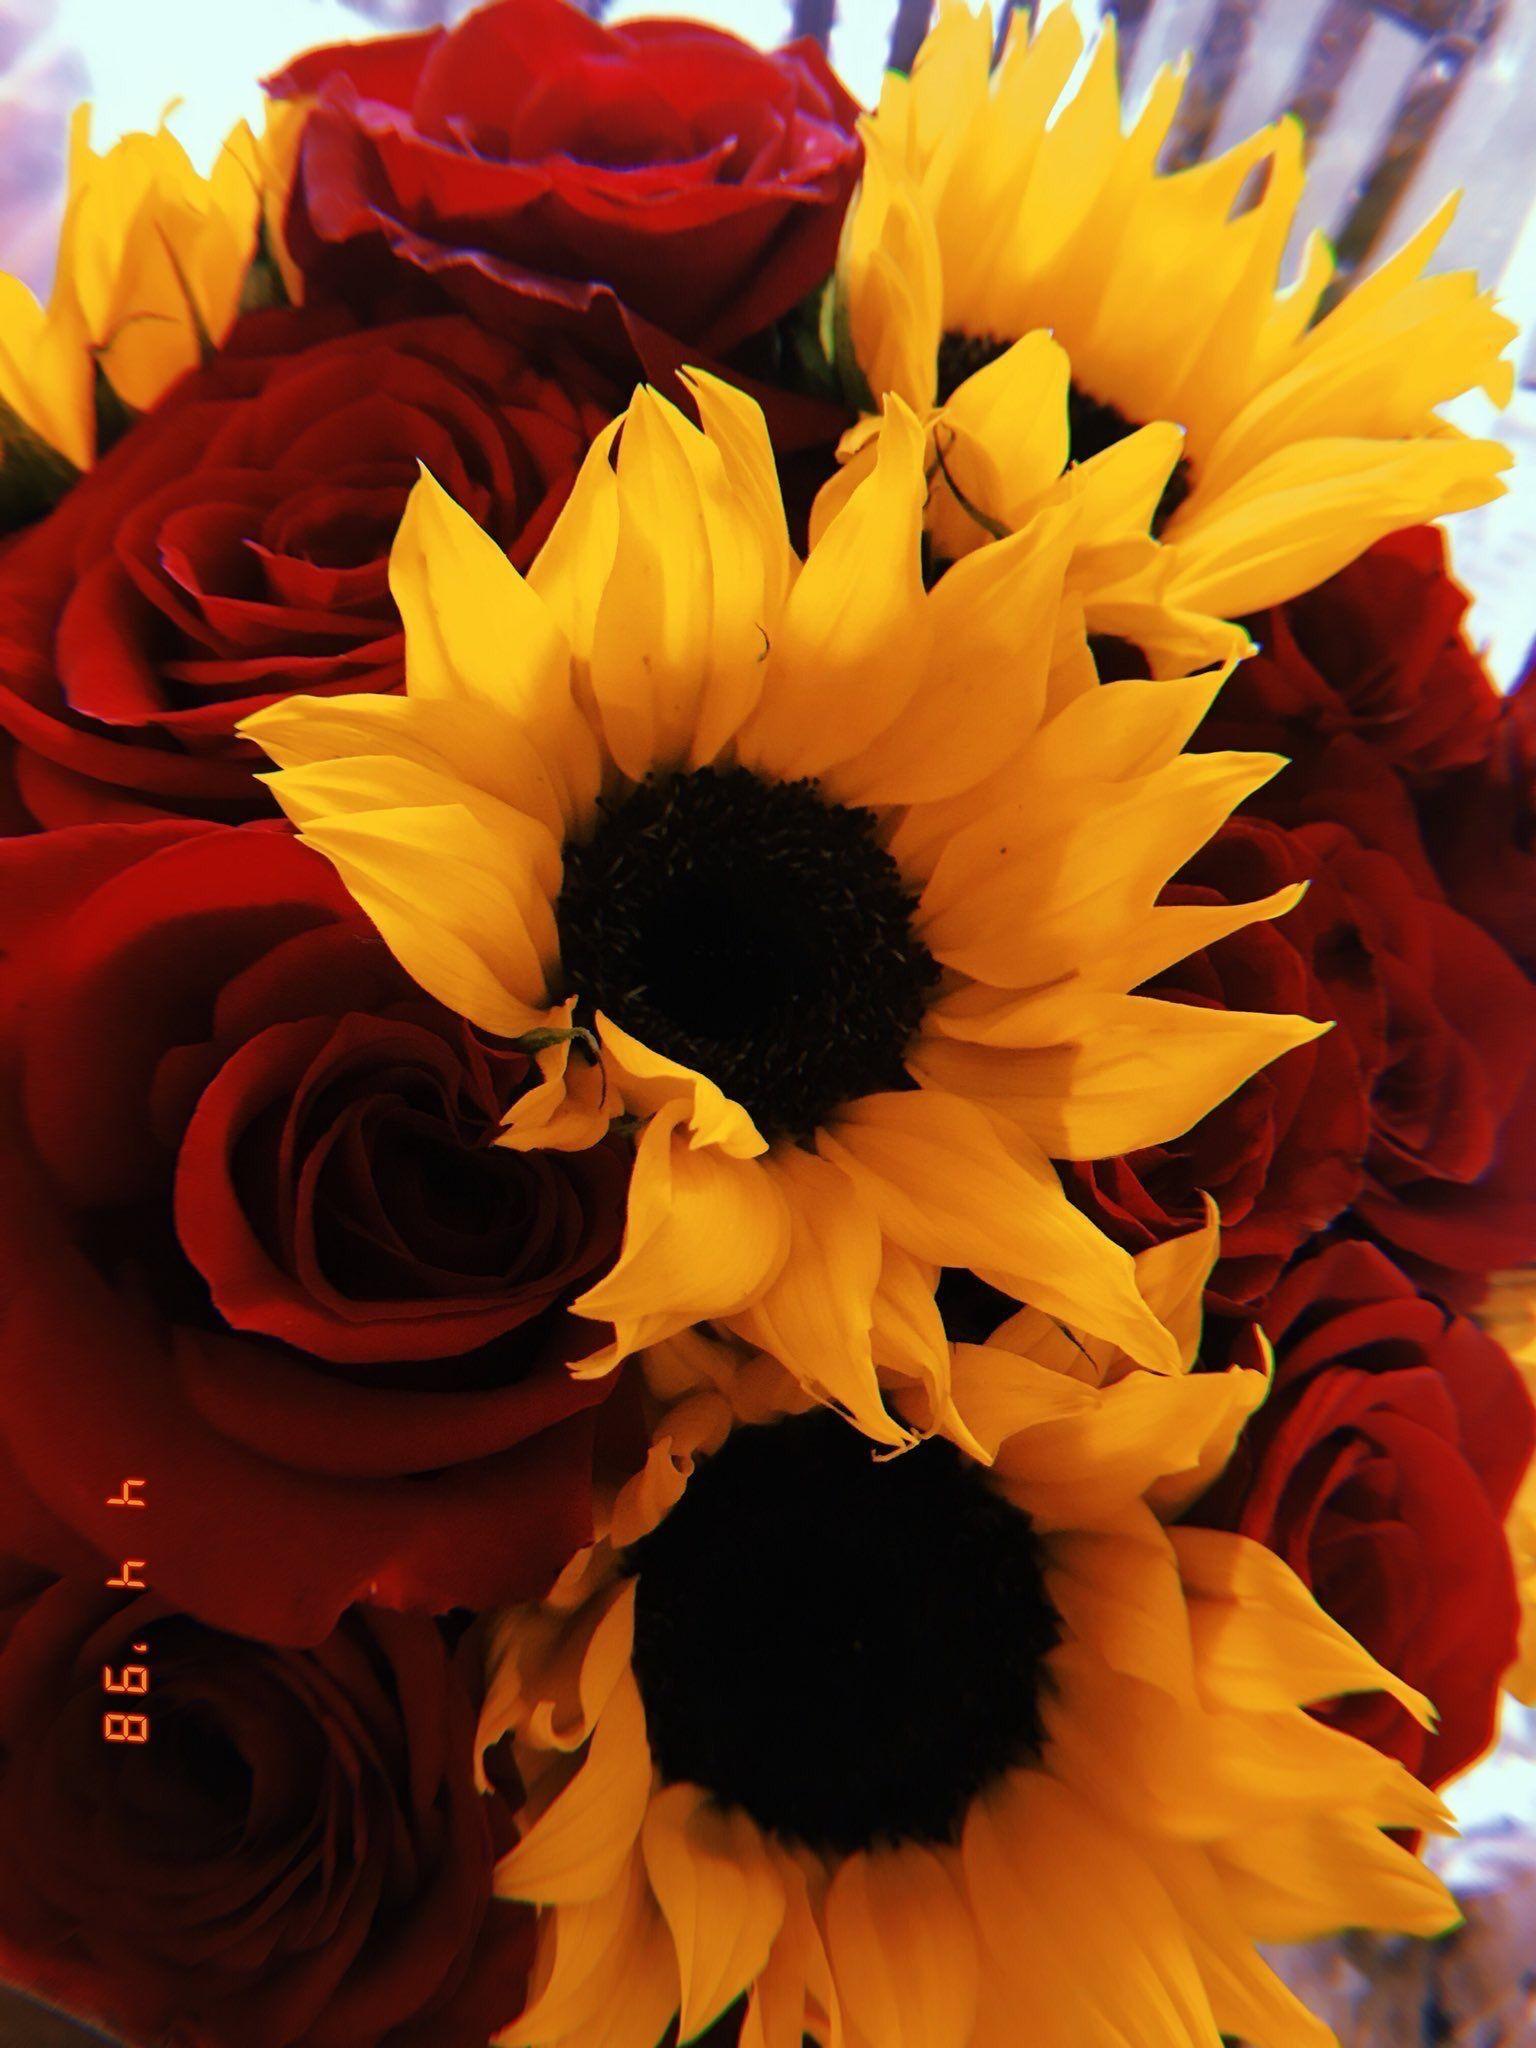 Sunflowers And Roses Sunflowers And Roses